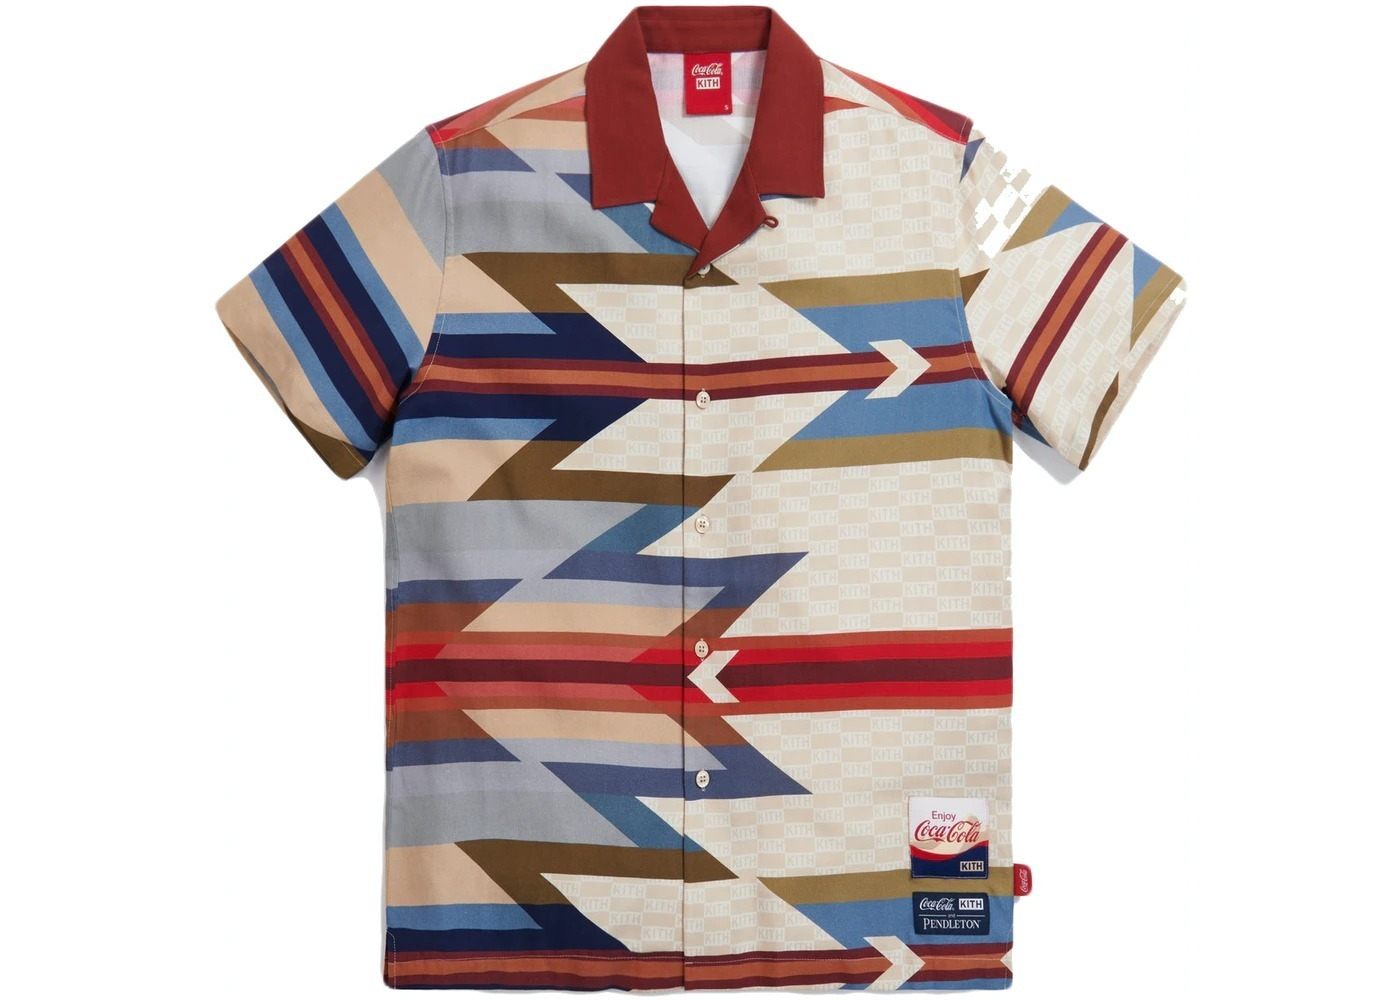 Kith x Coca-Cola x Pendleton Camp Collar Shirt Maroon/Multi の写真